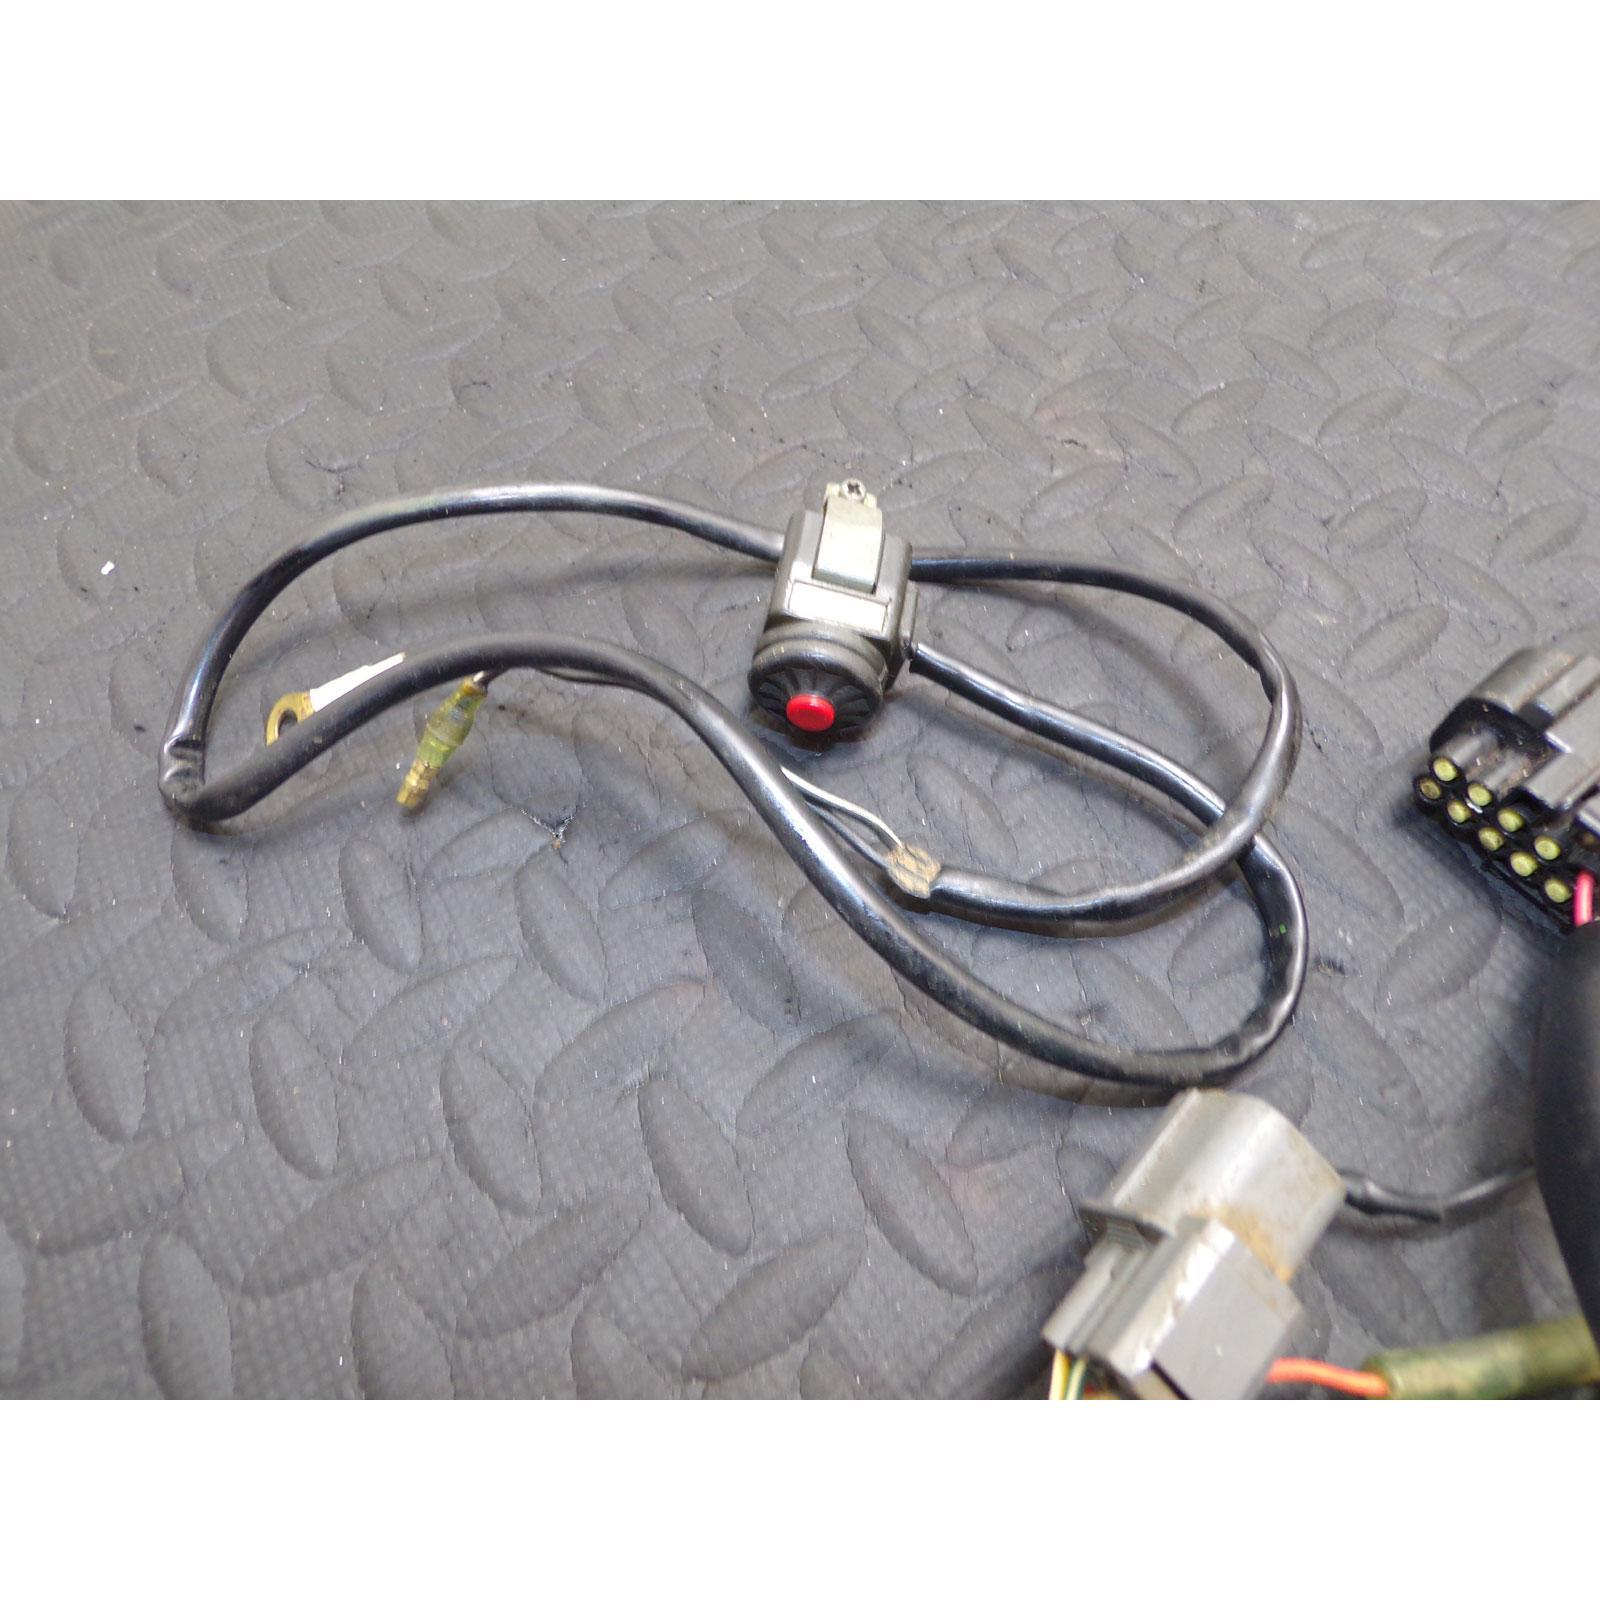 kx 125 2002 wiring loom harness 2k68 14982 KX 125 Monster Energy